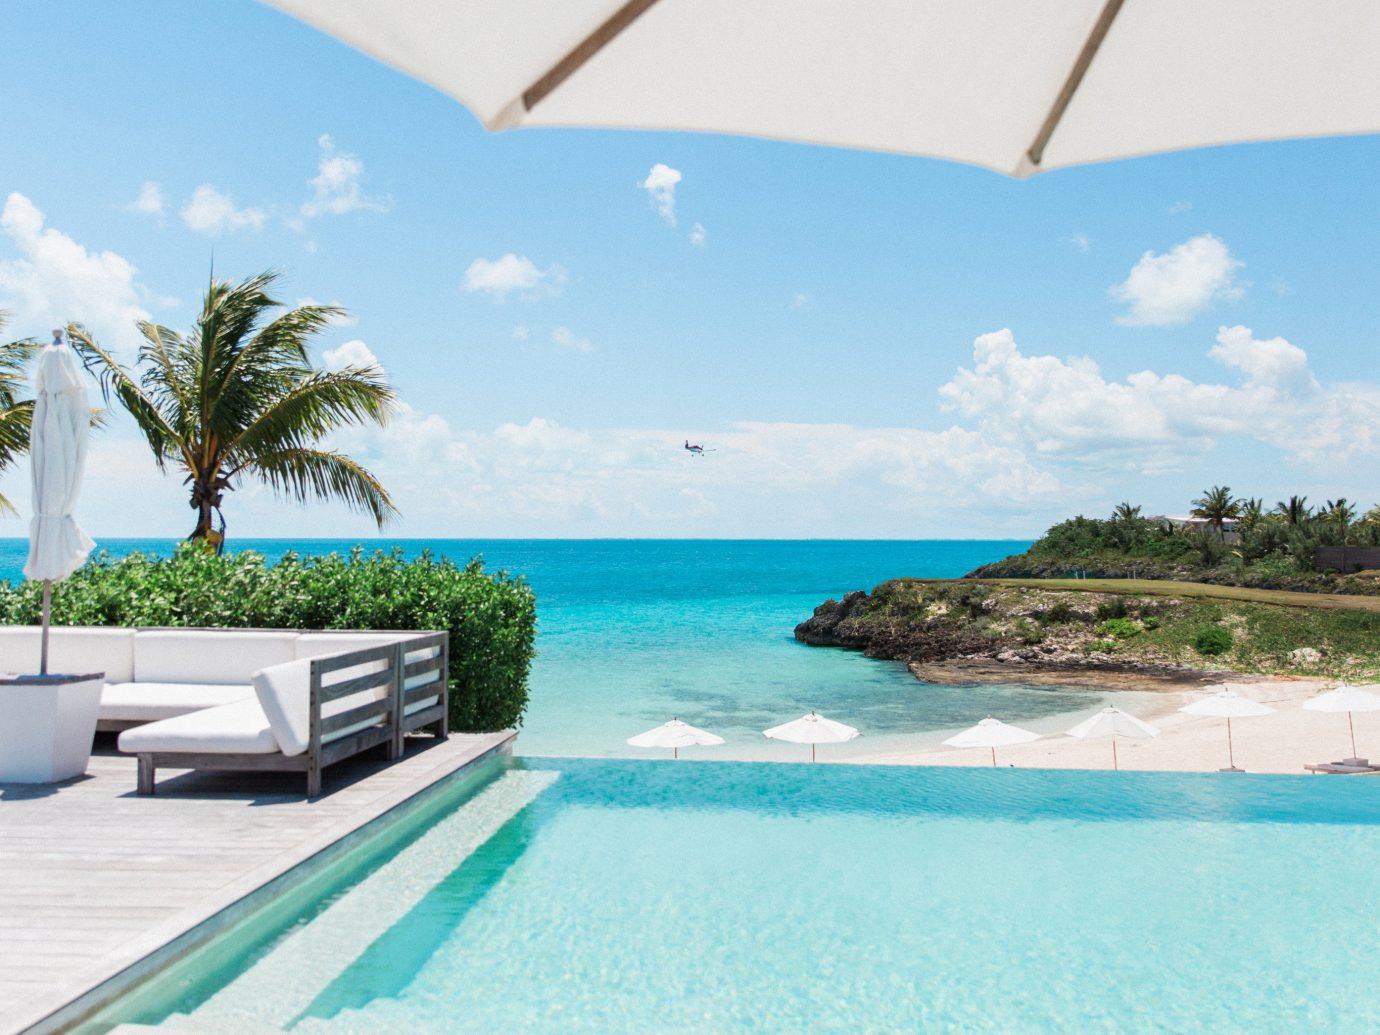 Hotels sky swimming pool outdoor caribbean property vacation leisure Sea Resort Beach Ocean estate Lagoon bay Villa Pool Island shore day